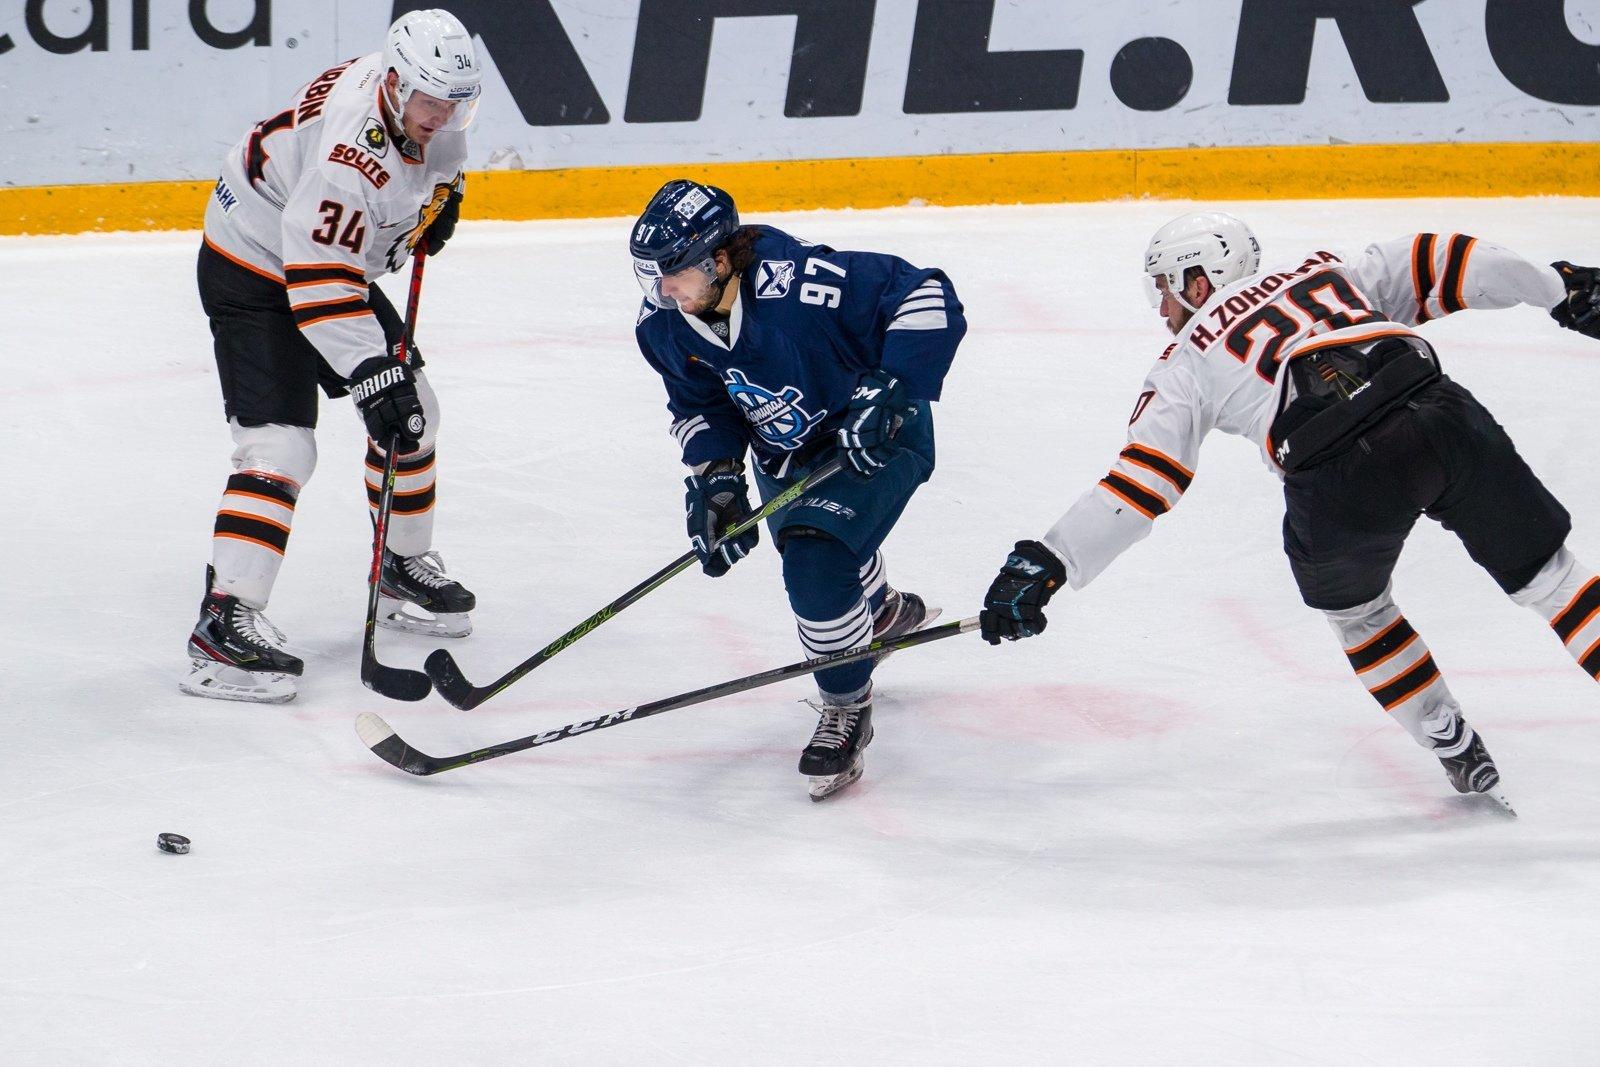 Коростелев заключил контракт с ЦСКА